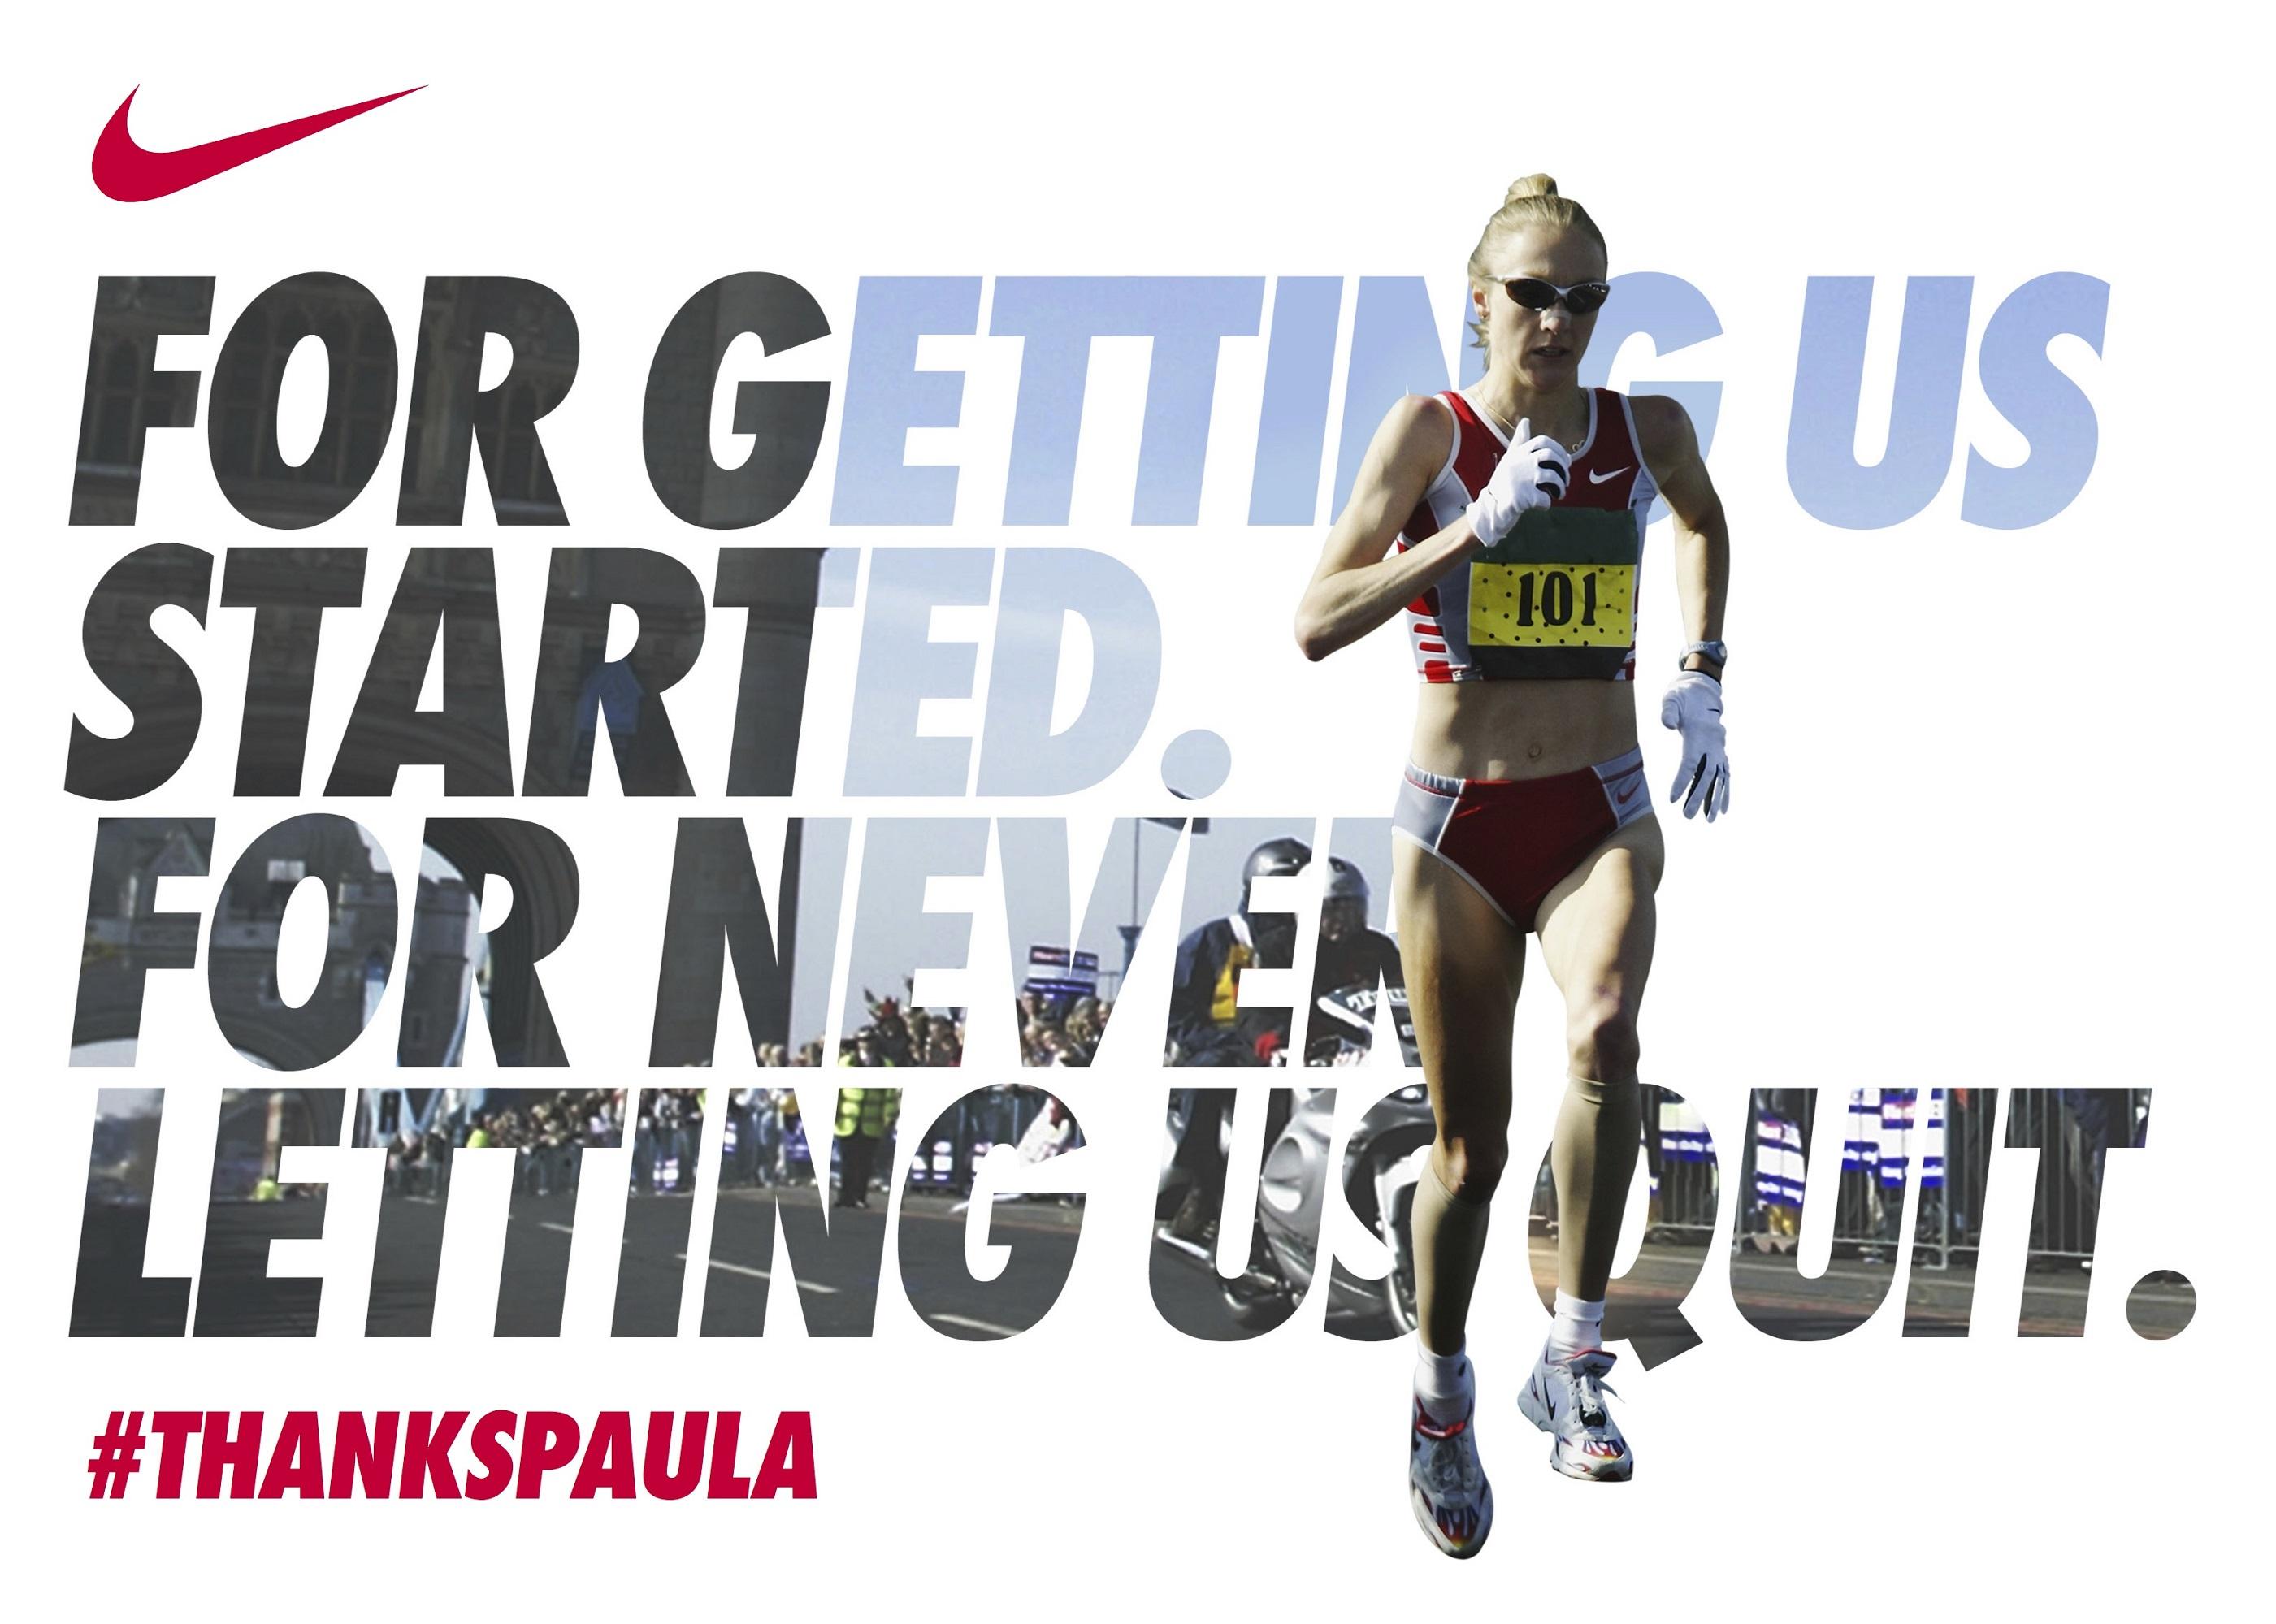 nike向传奇女子马拉松运动员paula radcliffe致敬